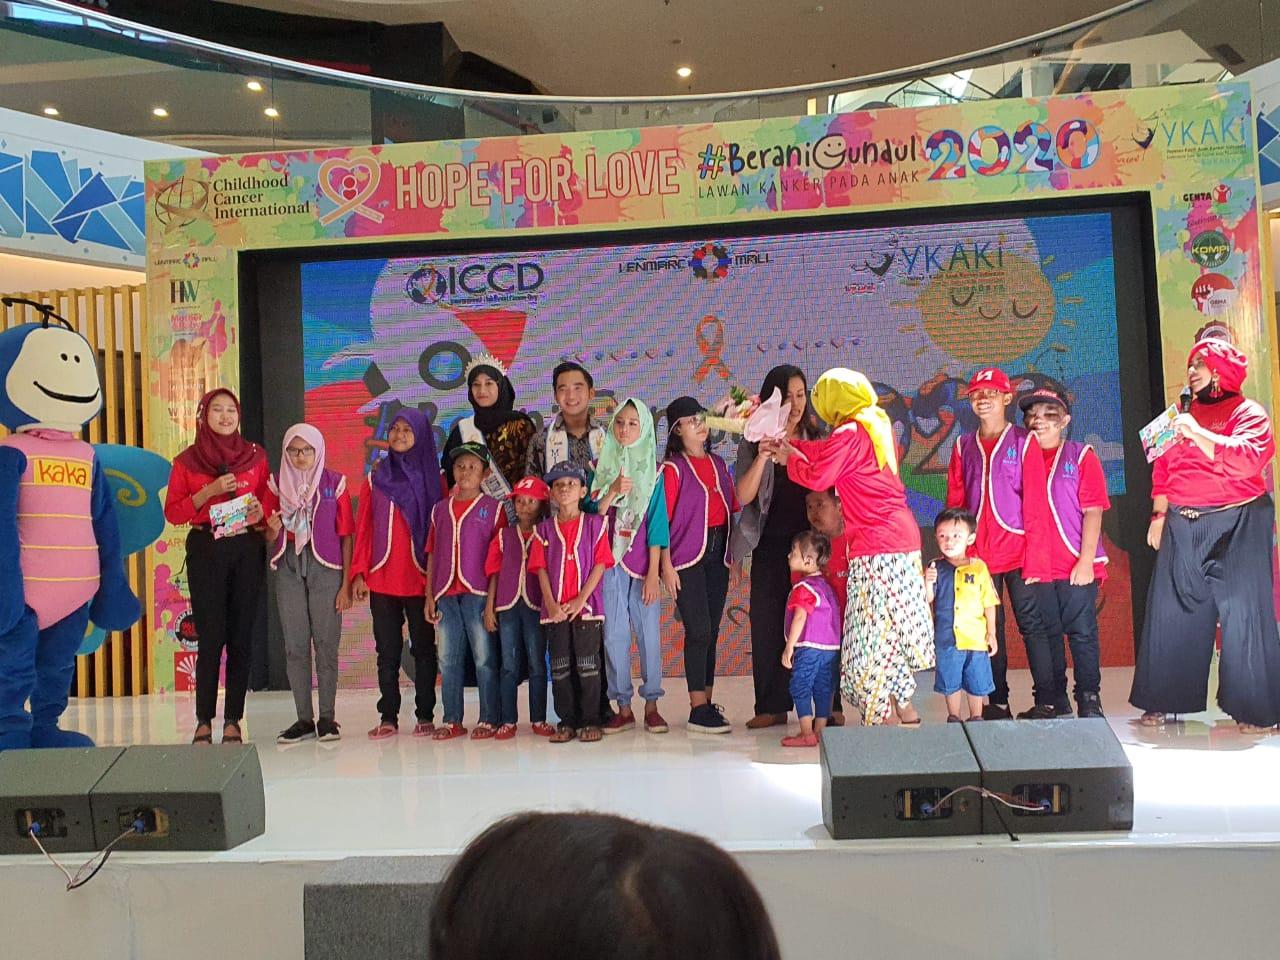 Gandeng YKAKI, Gema Indonesia Gelar Peduli Kasih Bagi Anak Penderita ...